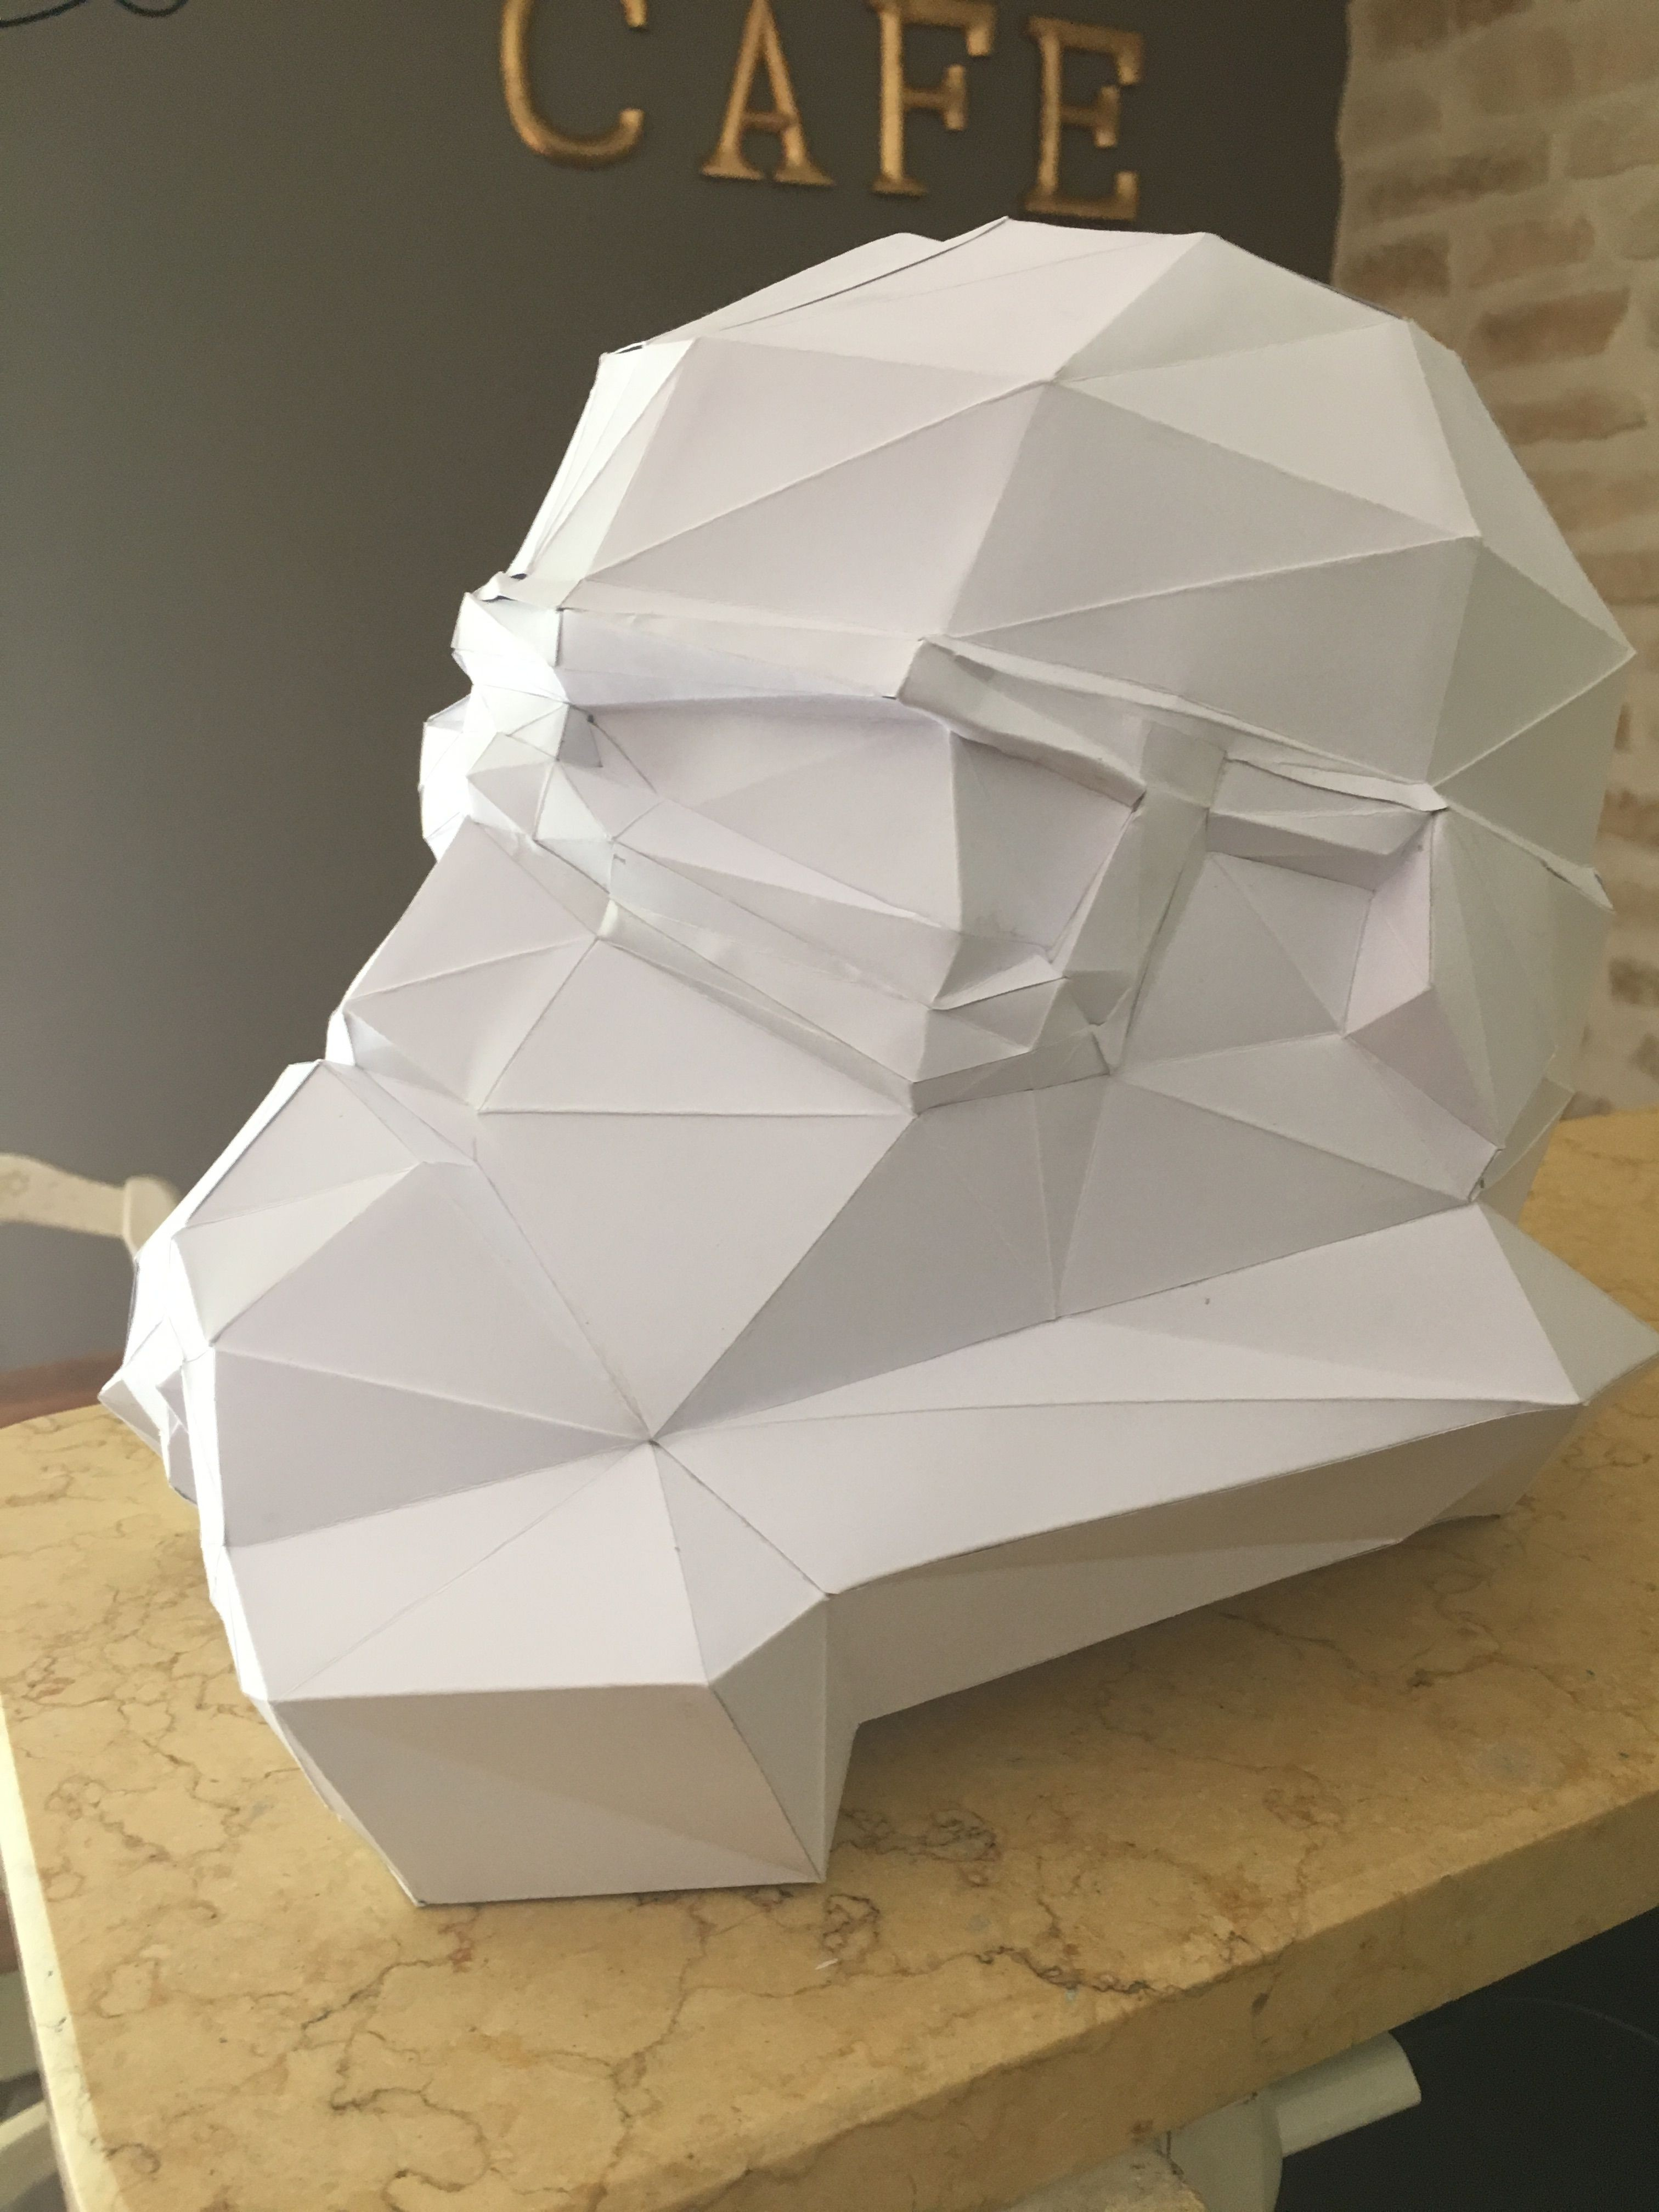 Papercraft Star Wars Stormtrooper Papercraft La Guerre Des étoiles Star Wars